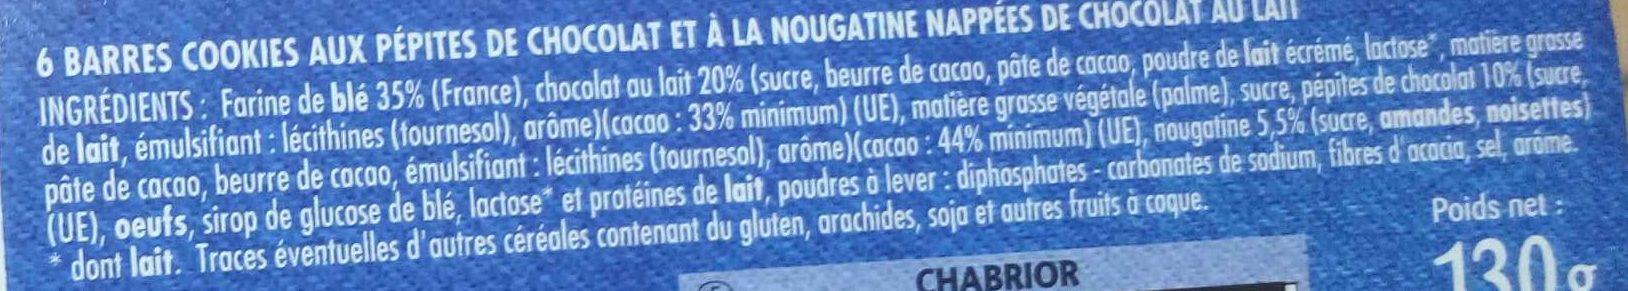 Cookies Pocket nougatine & pépites de chocolat - Ingredients - fr